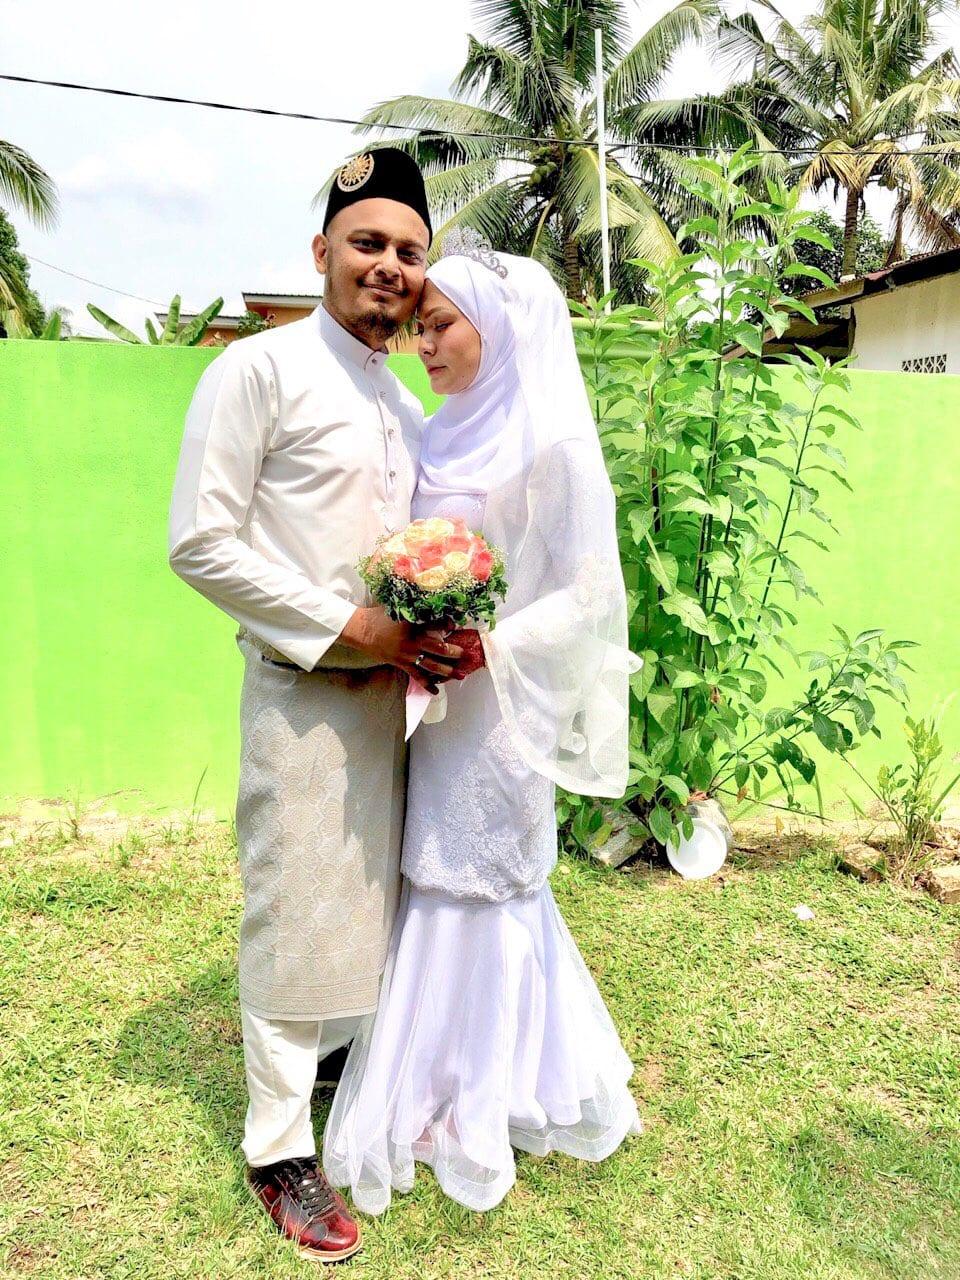 1st Date Di HospitaI, Siapa Sangka 2 Survivor Barah Kini Sah Jadi Suami Isteri!